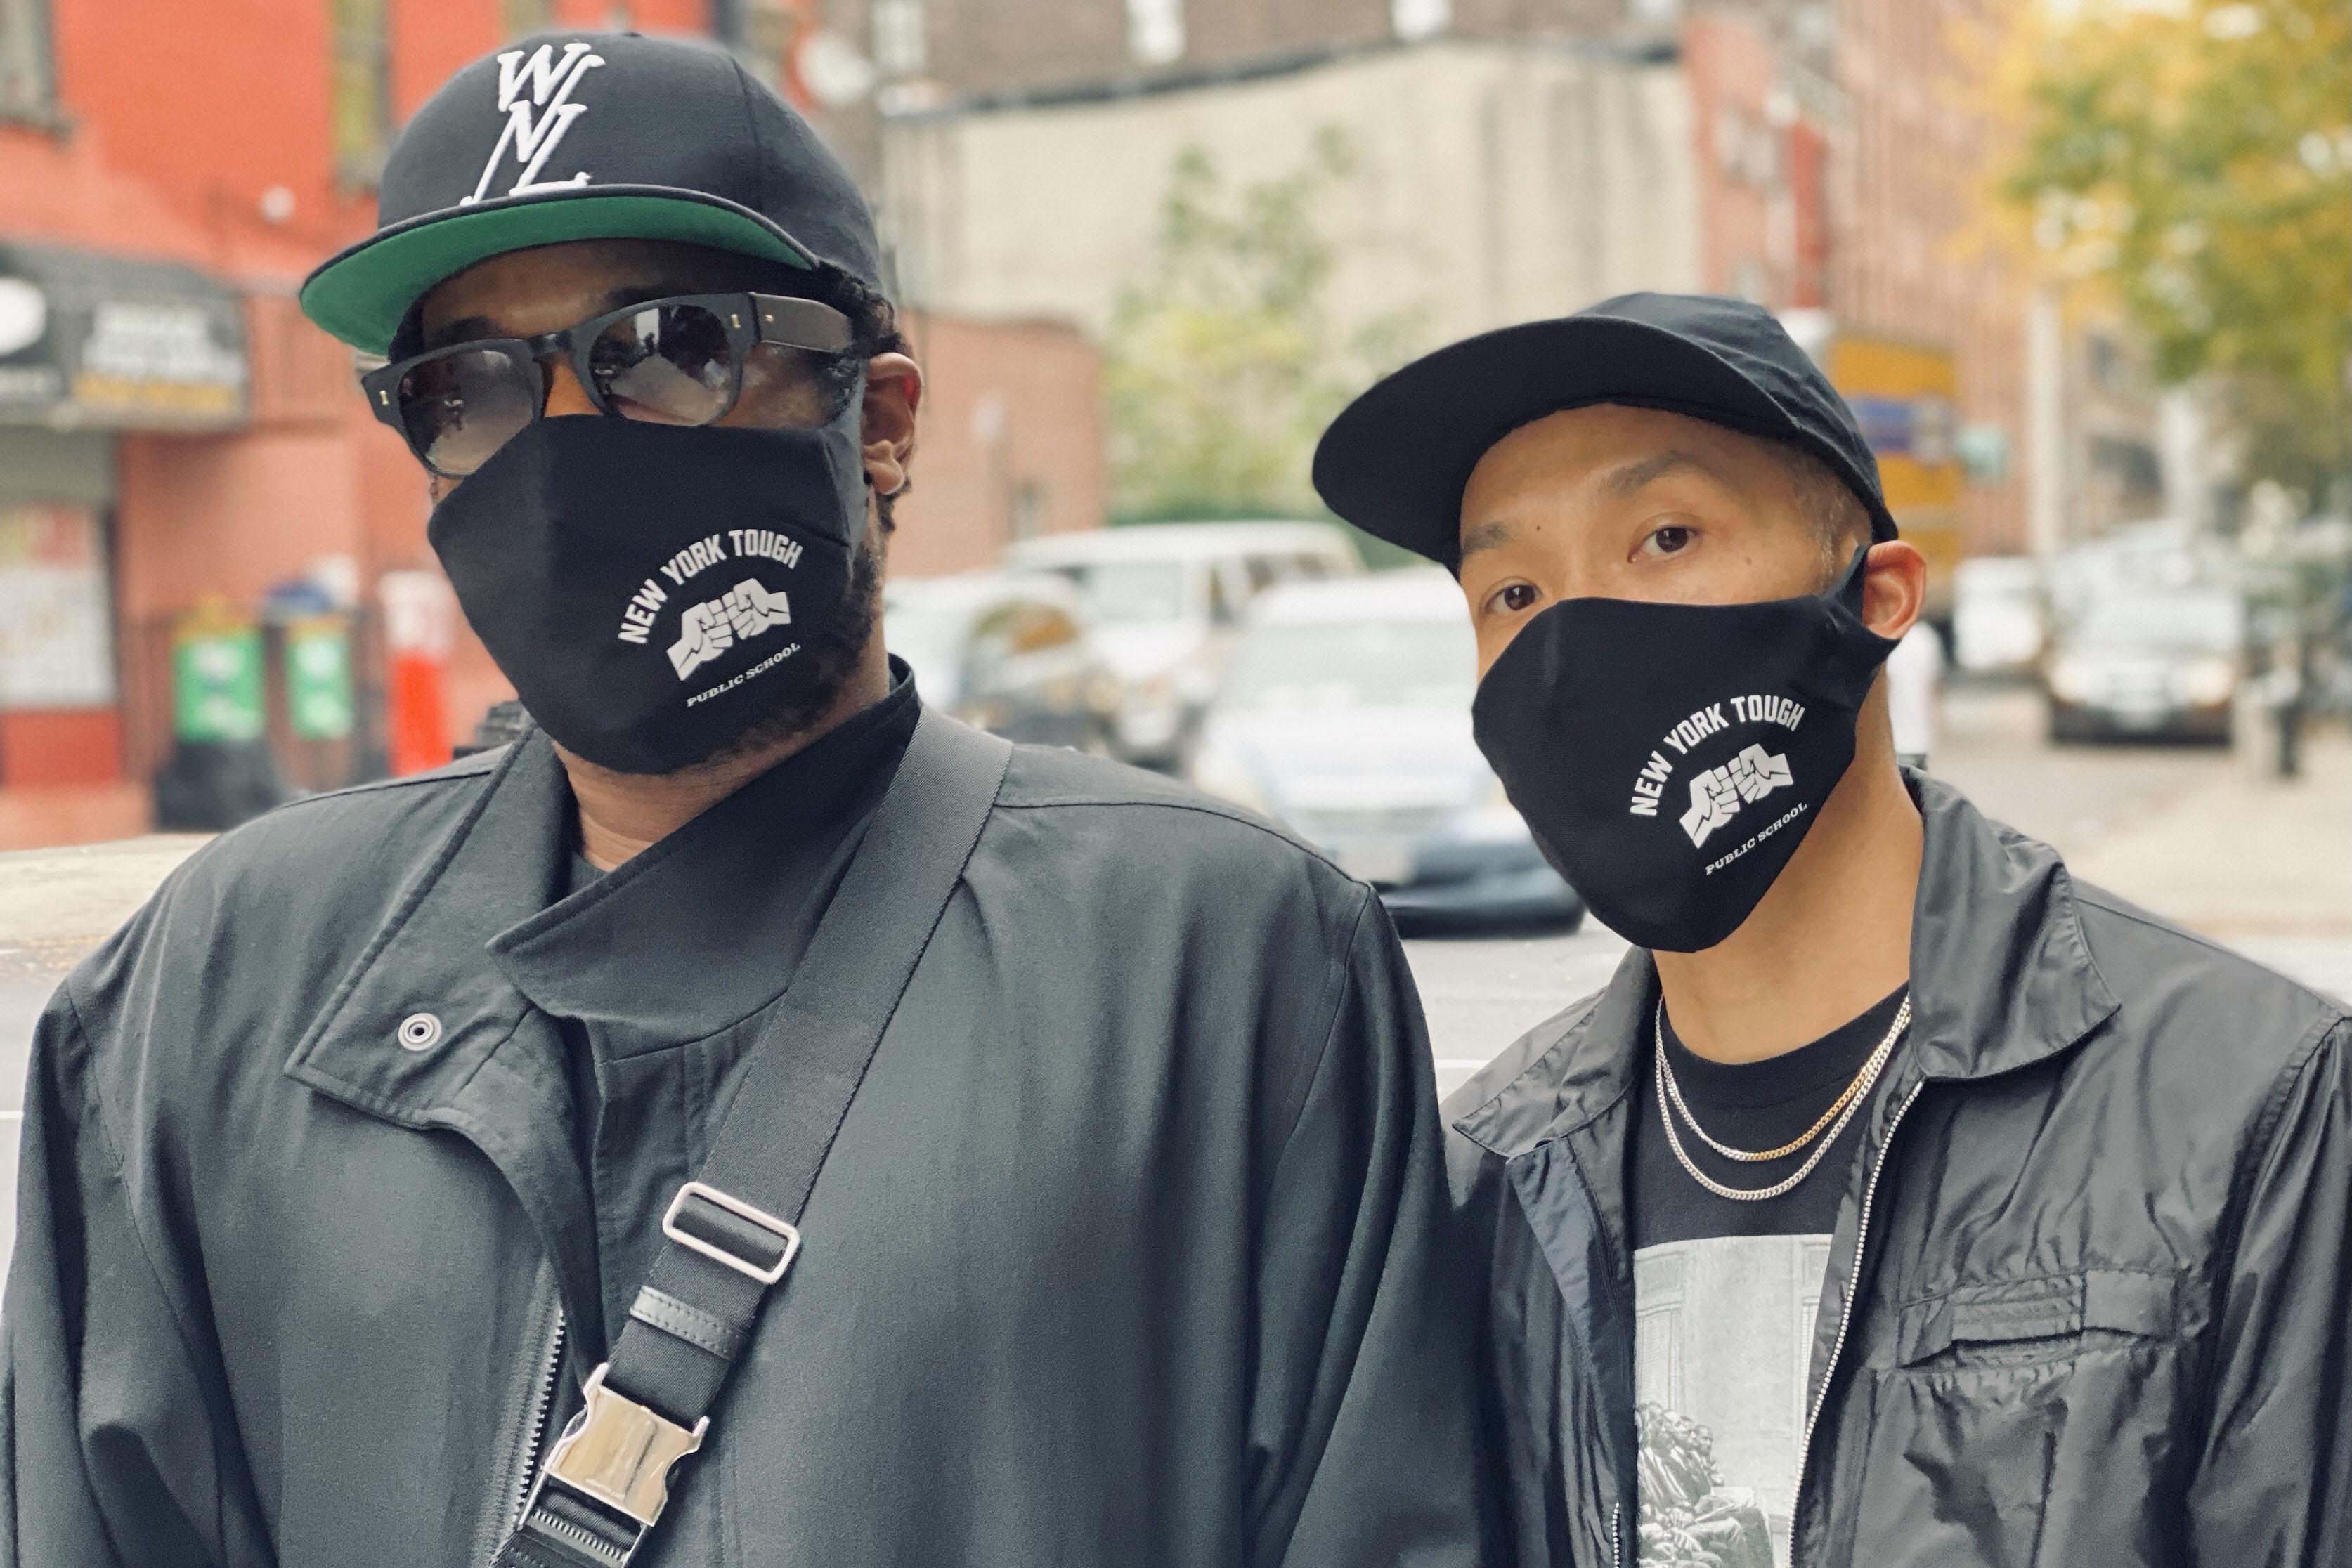 Public School designers Maxwell Osborne and Dao-Yi Chow in their mask.